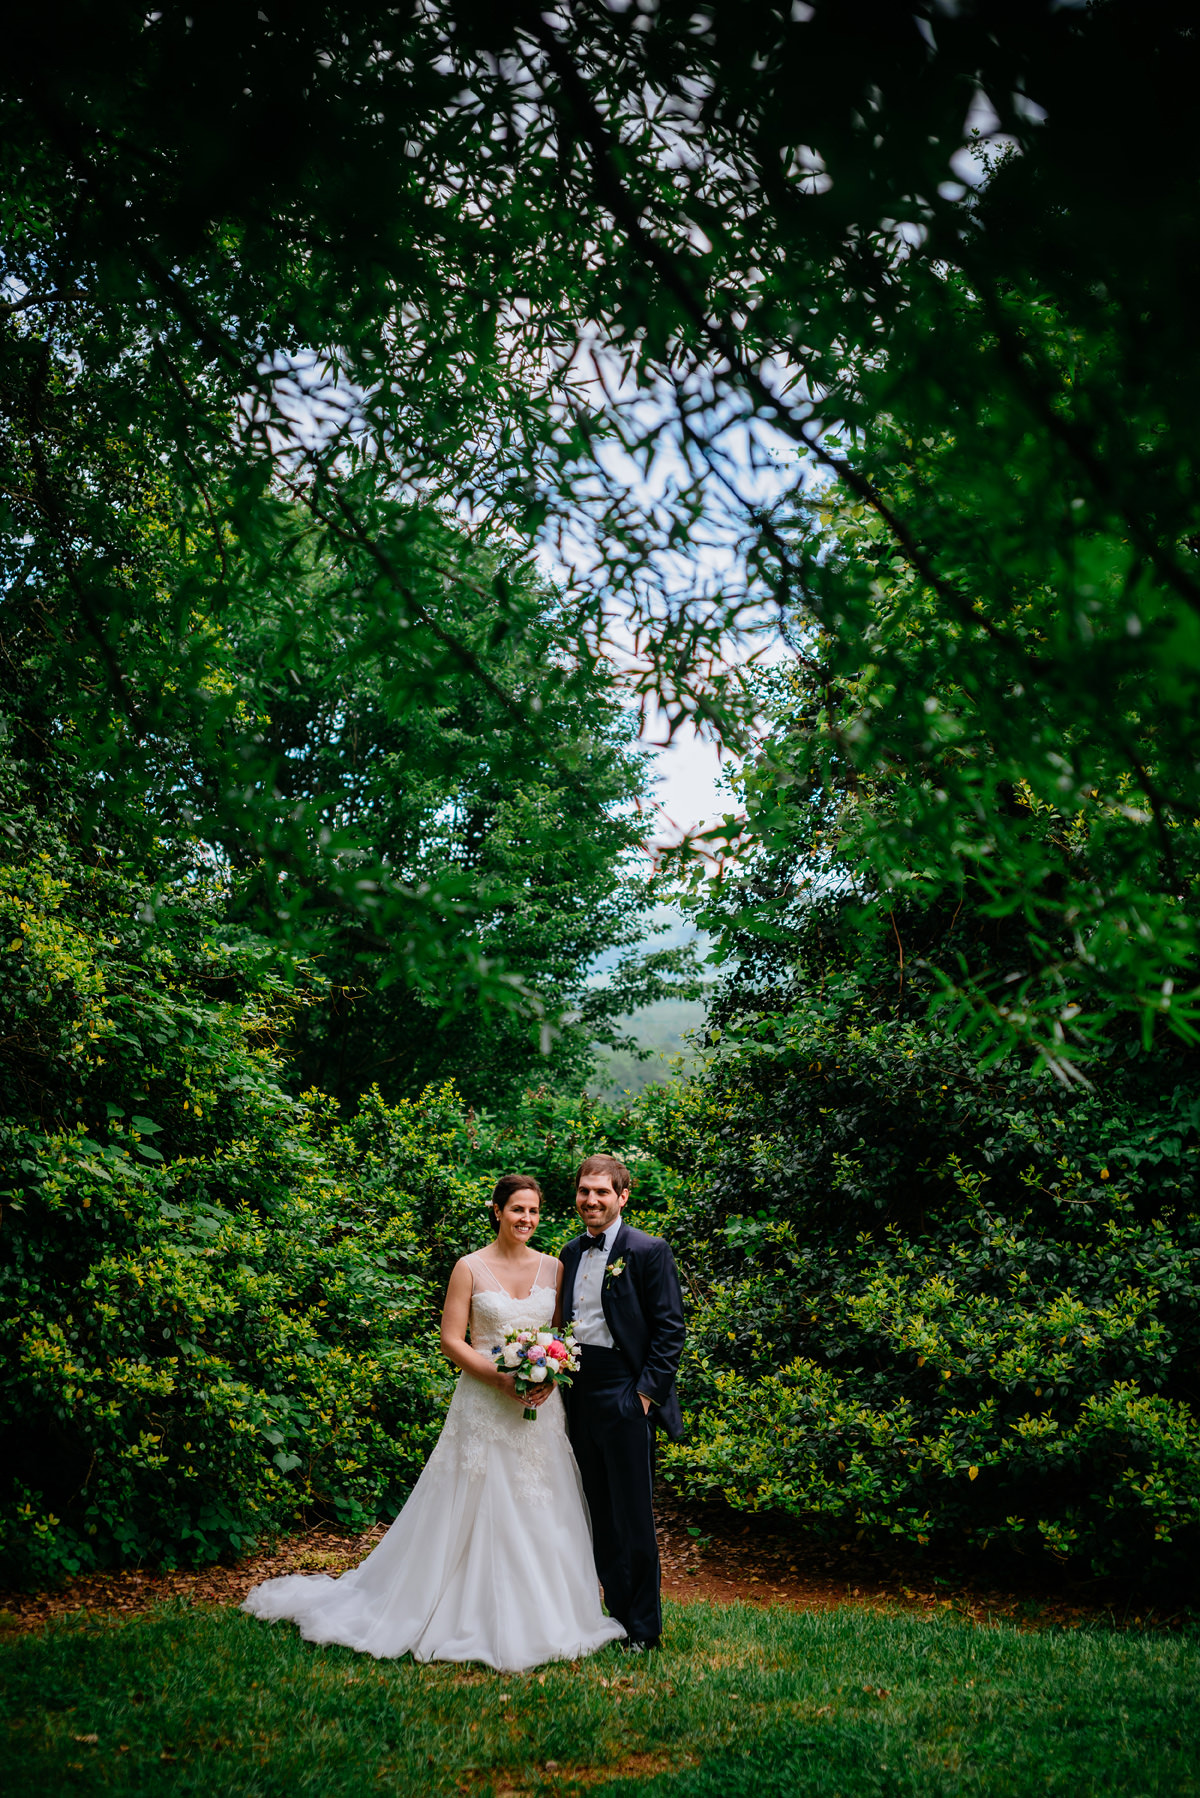 springtime virginia wedding bride and groom portrait 2